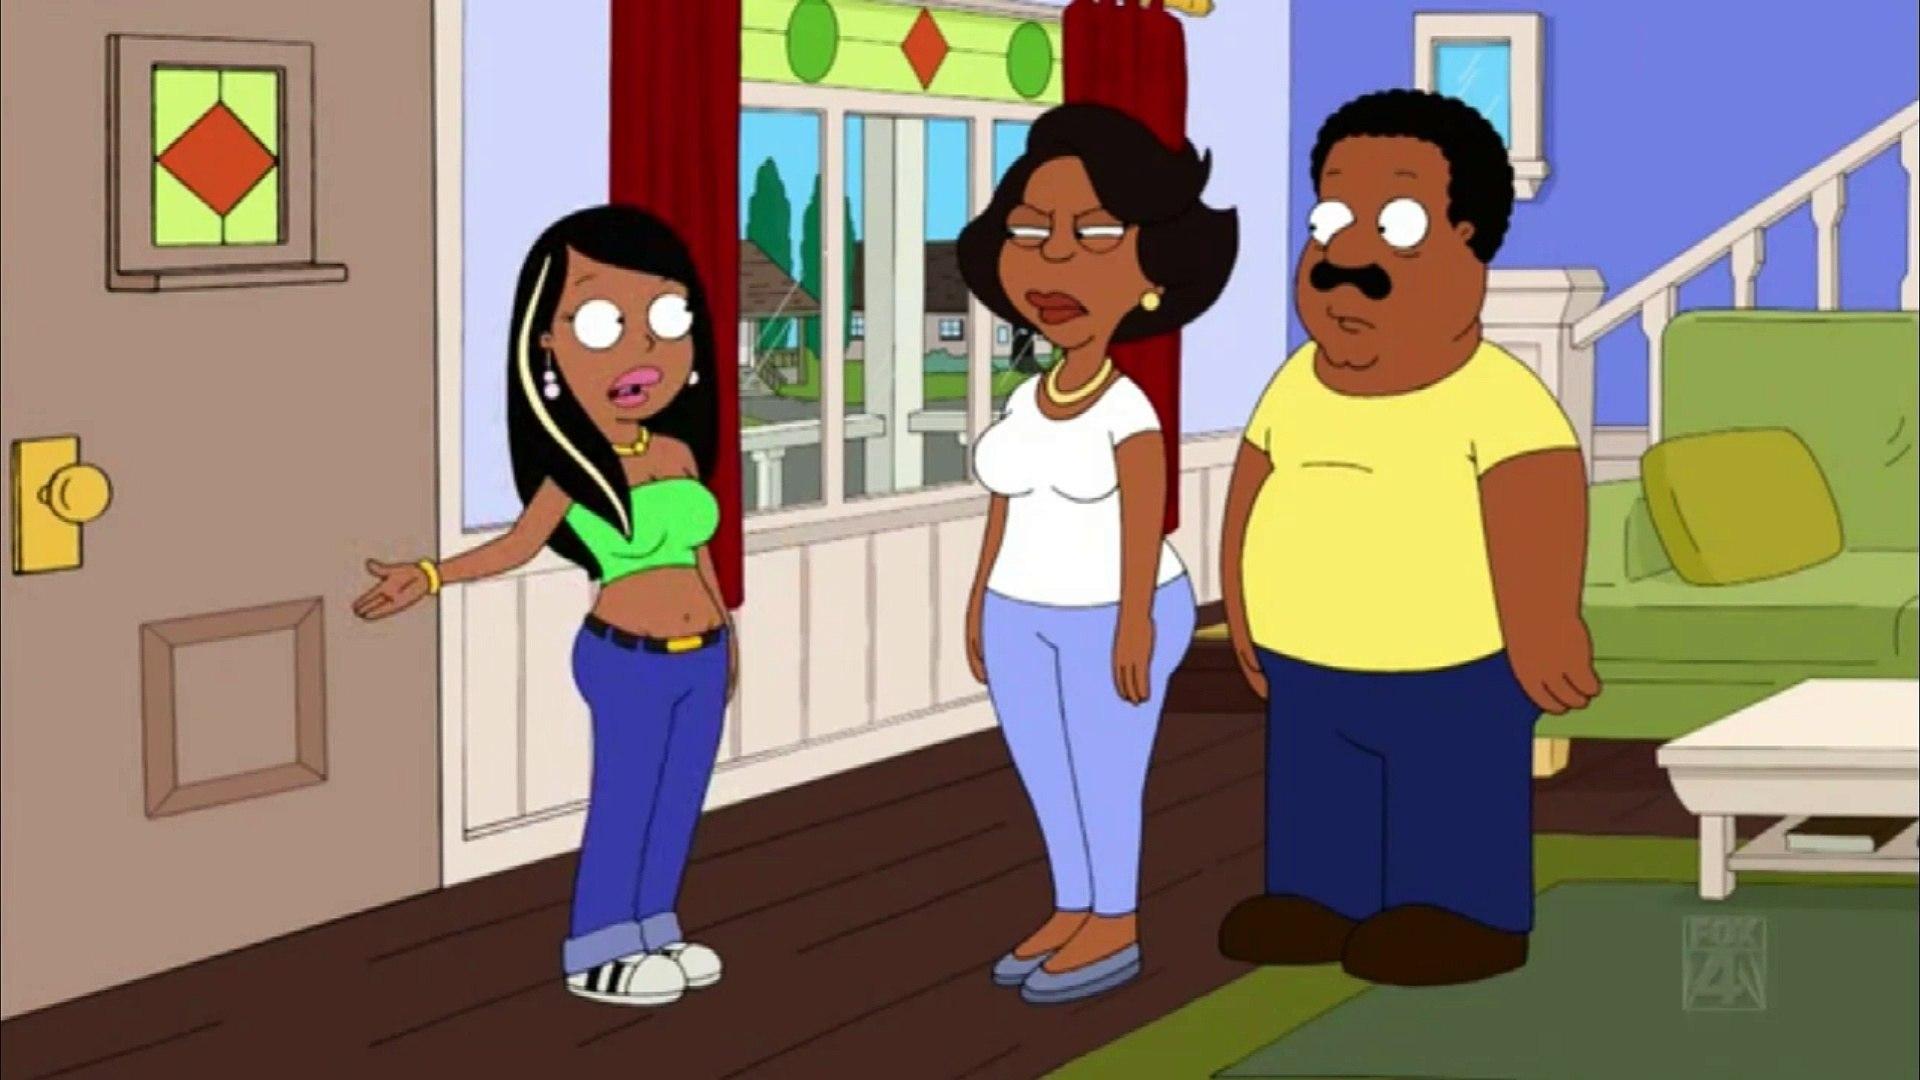 The Cleveland Show S01E01 Clip#1.